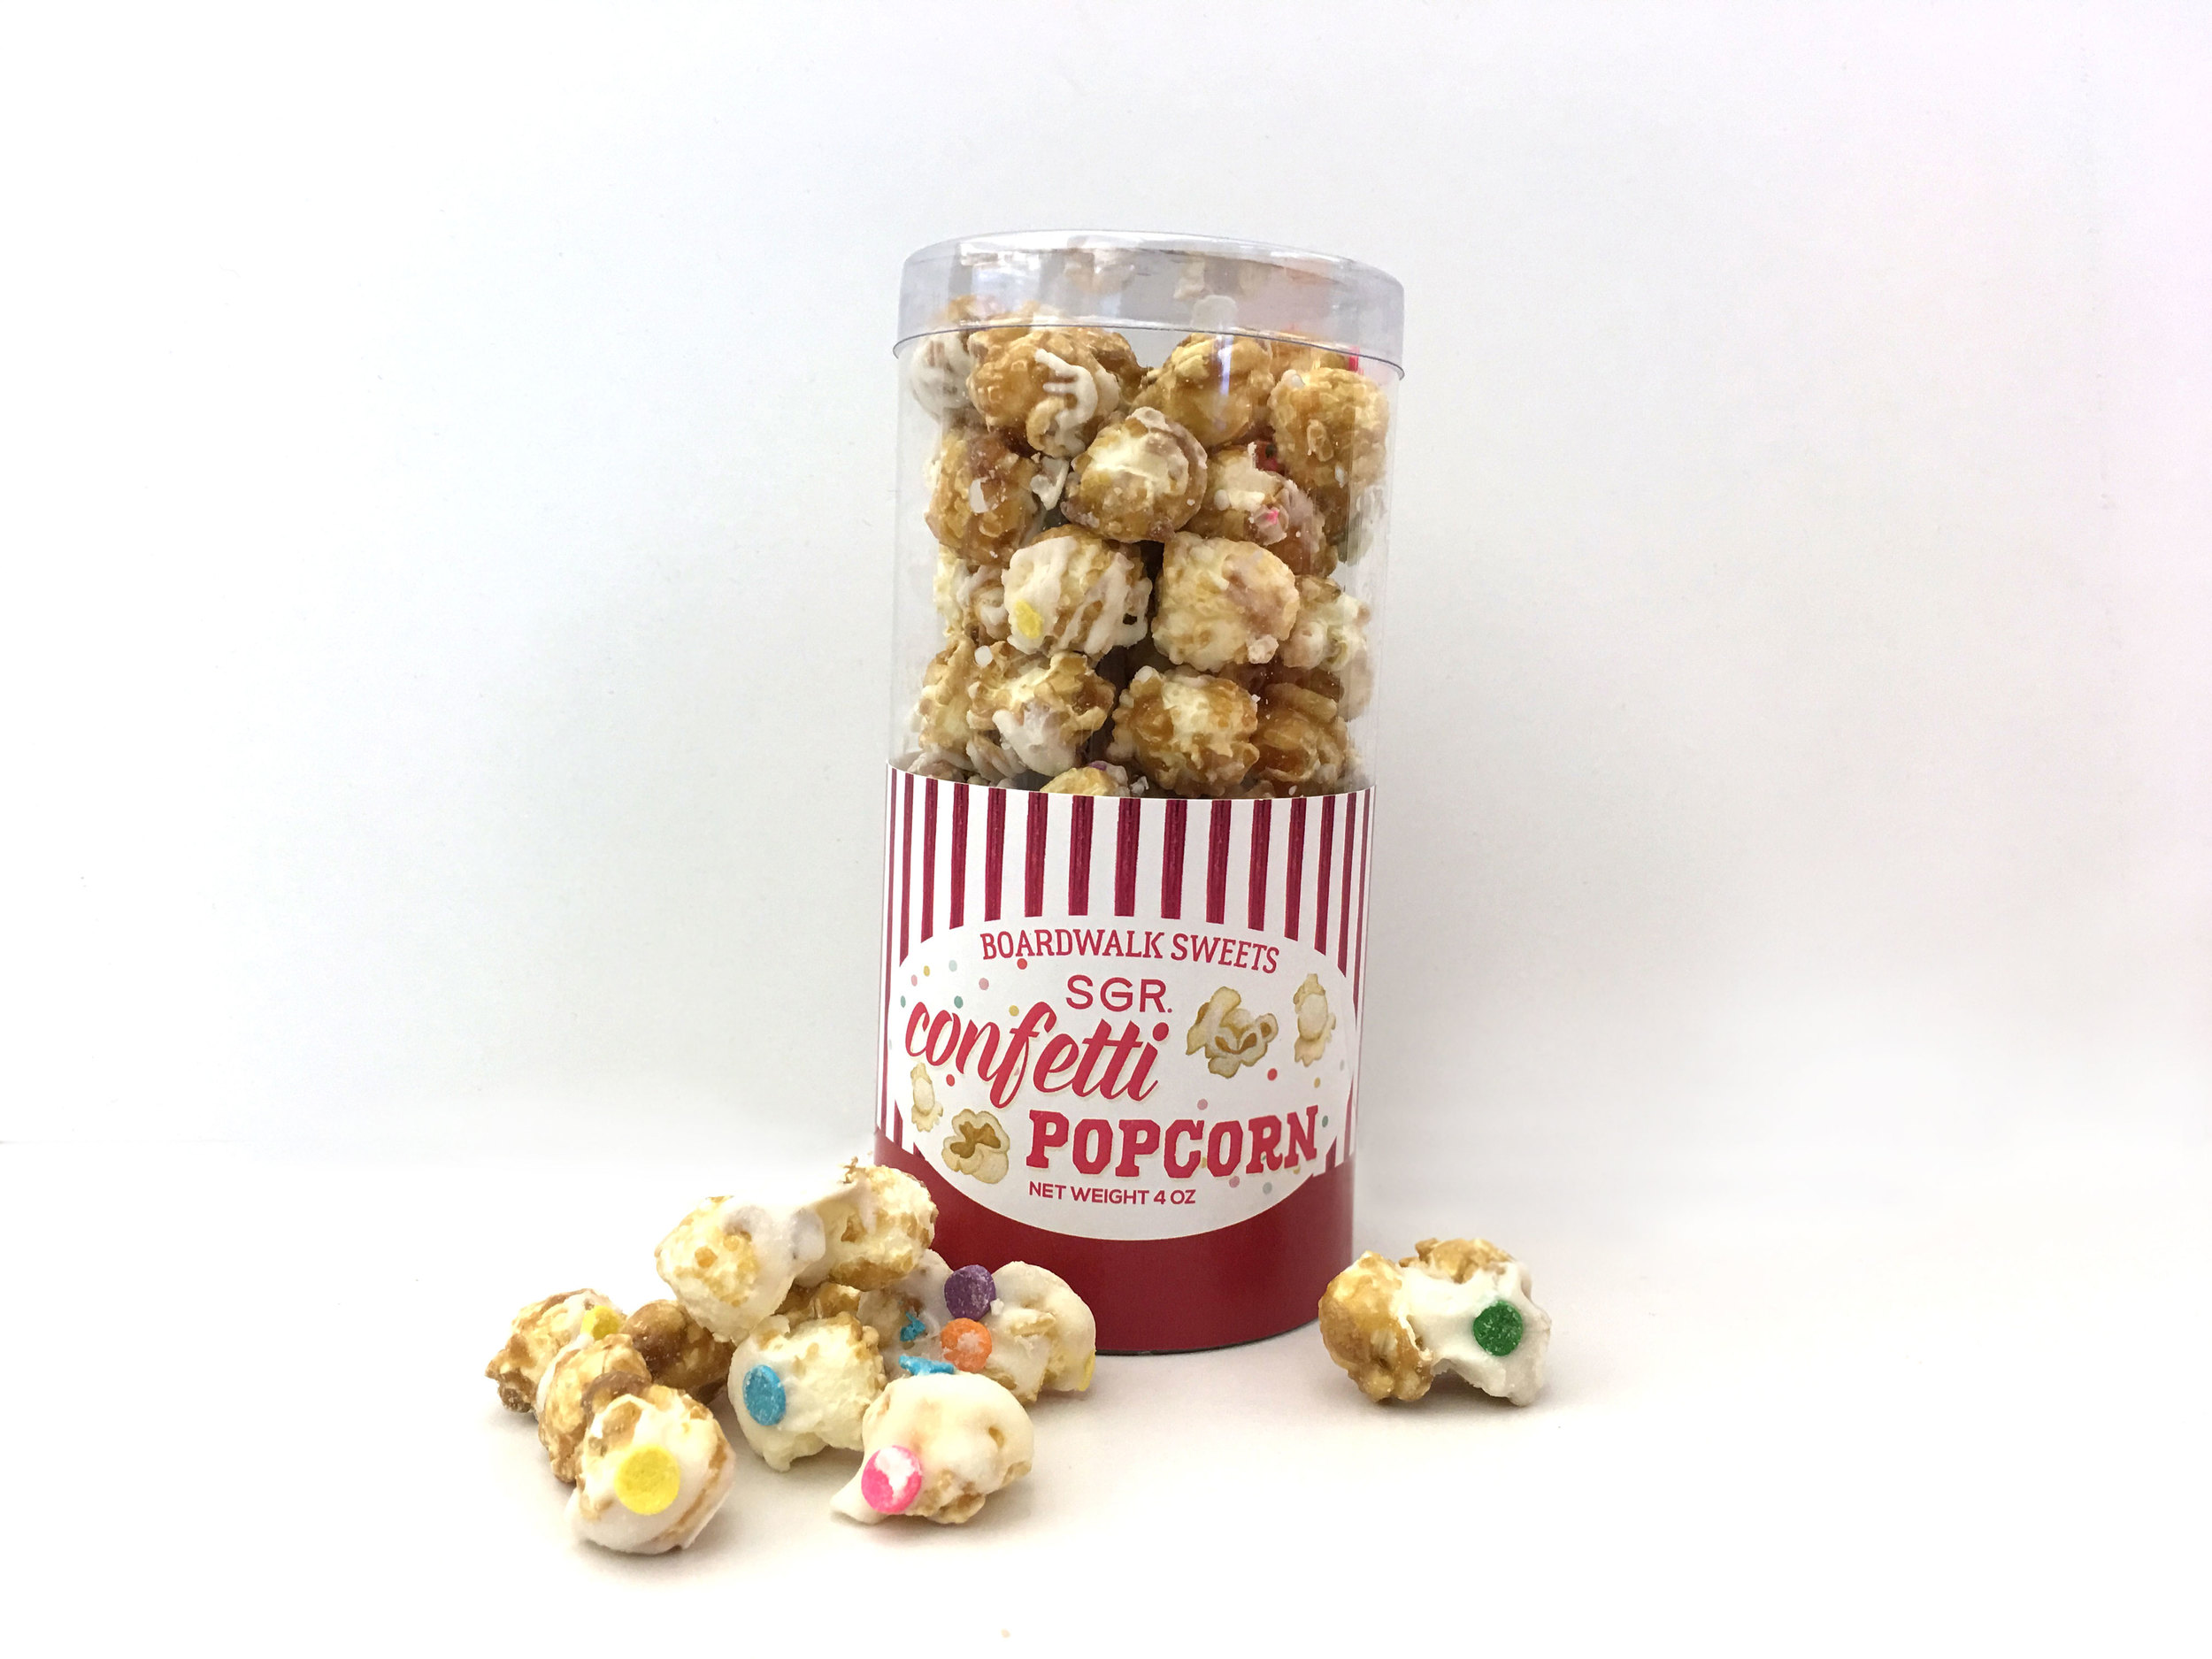 popcorn.notext.jpg